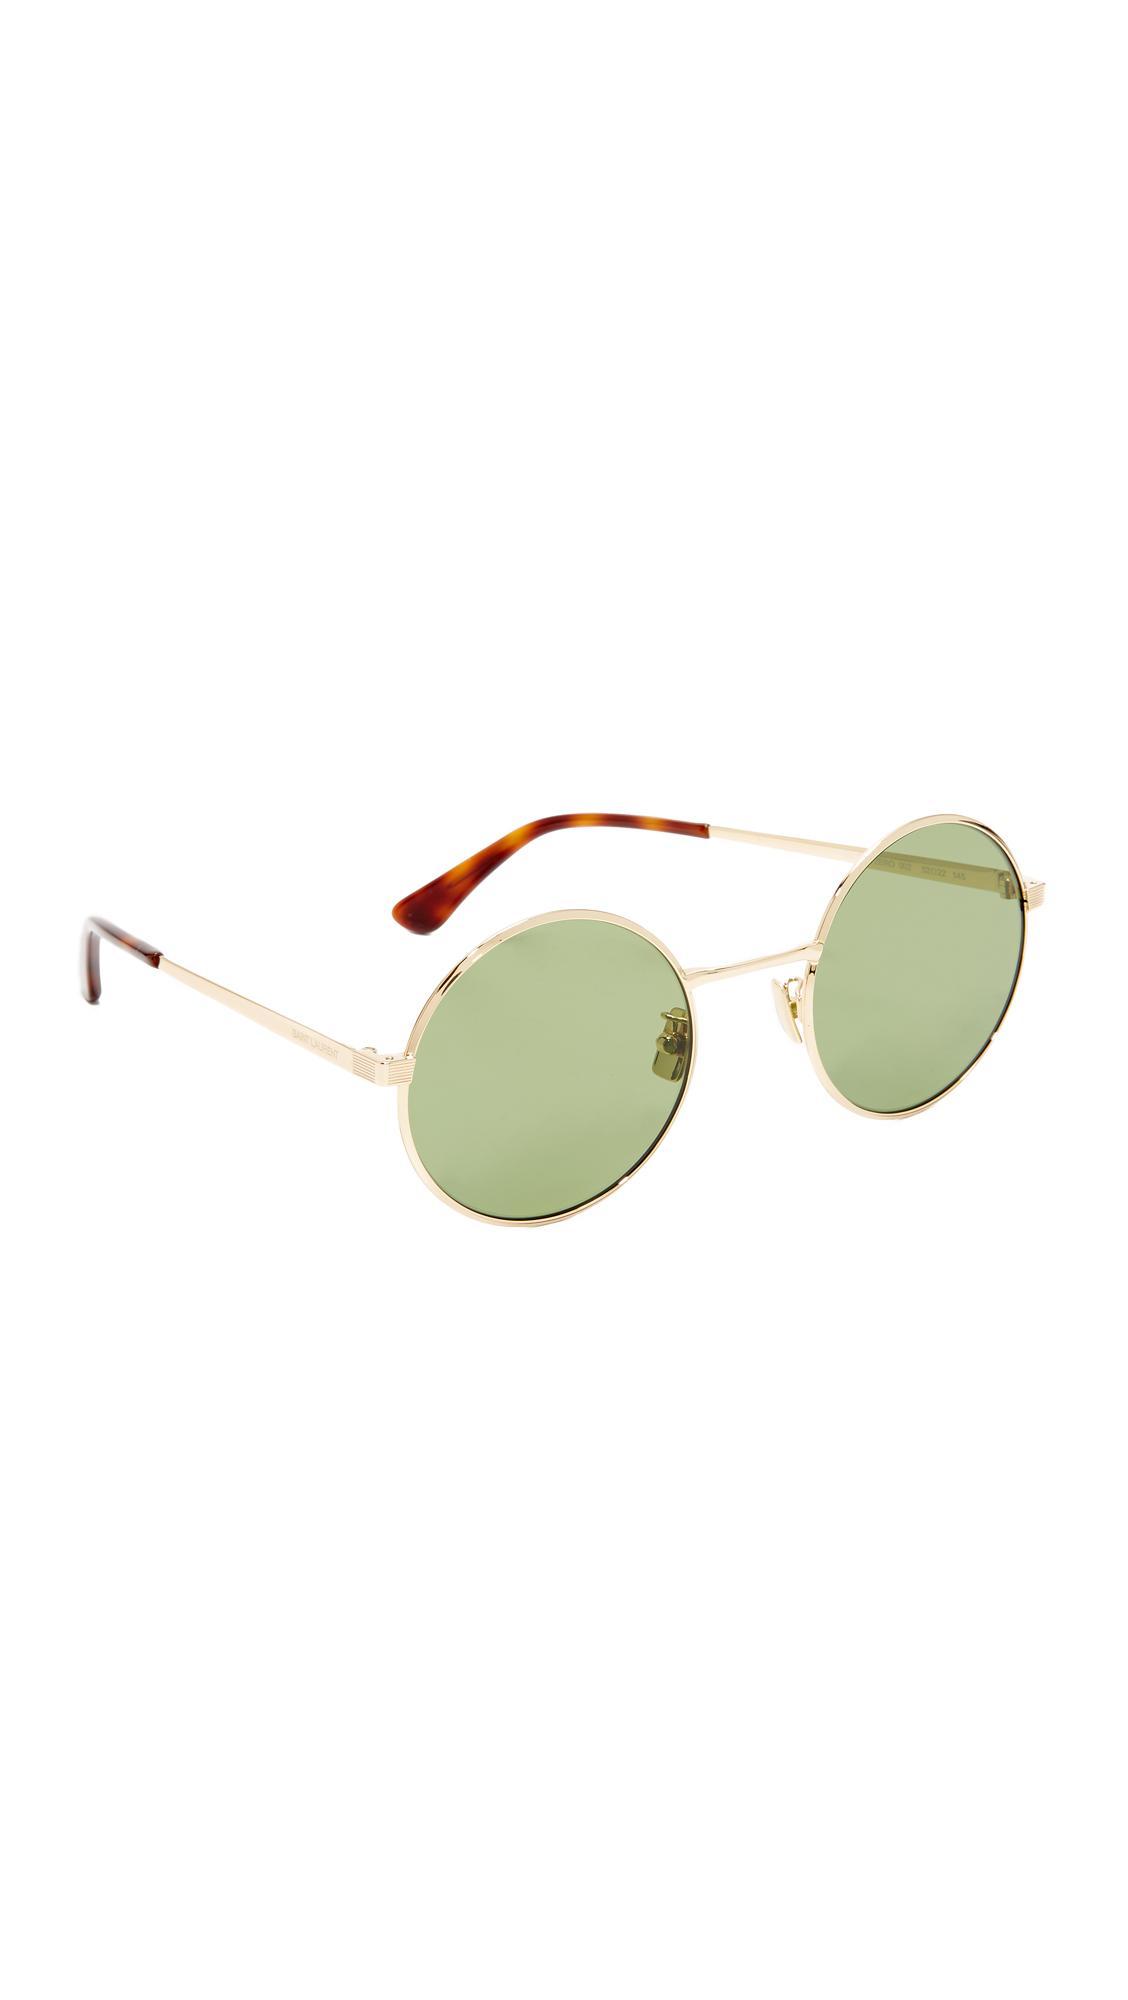 f5679ceb74 Saint Laurent Sl 136 Zero Base Mineral Lense Round Sunglasses in ...